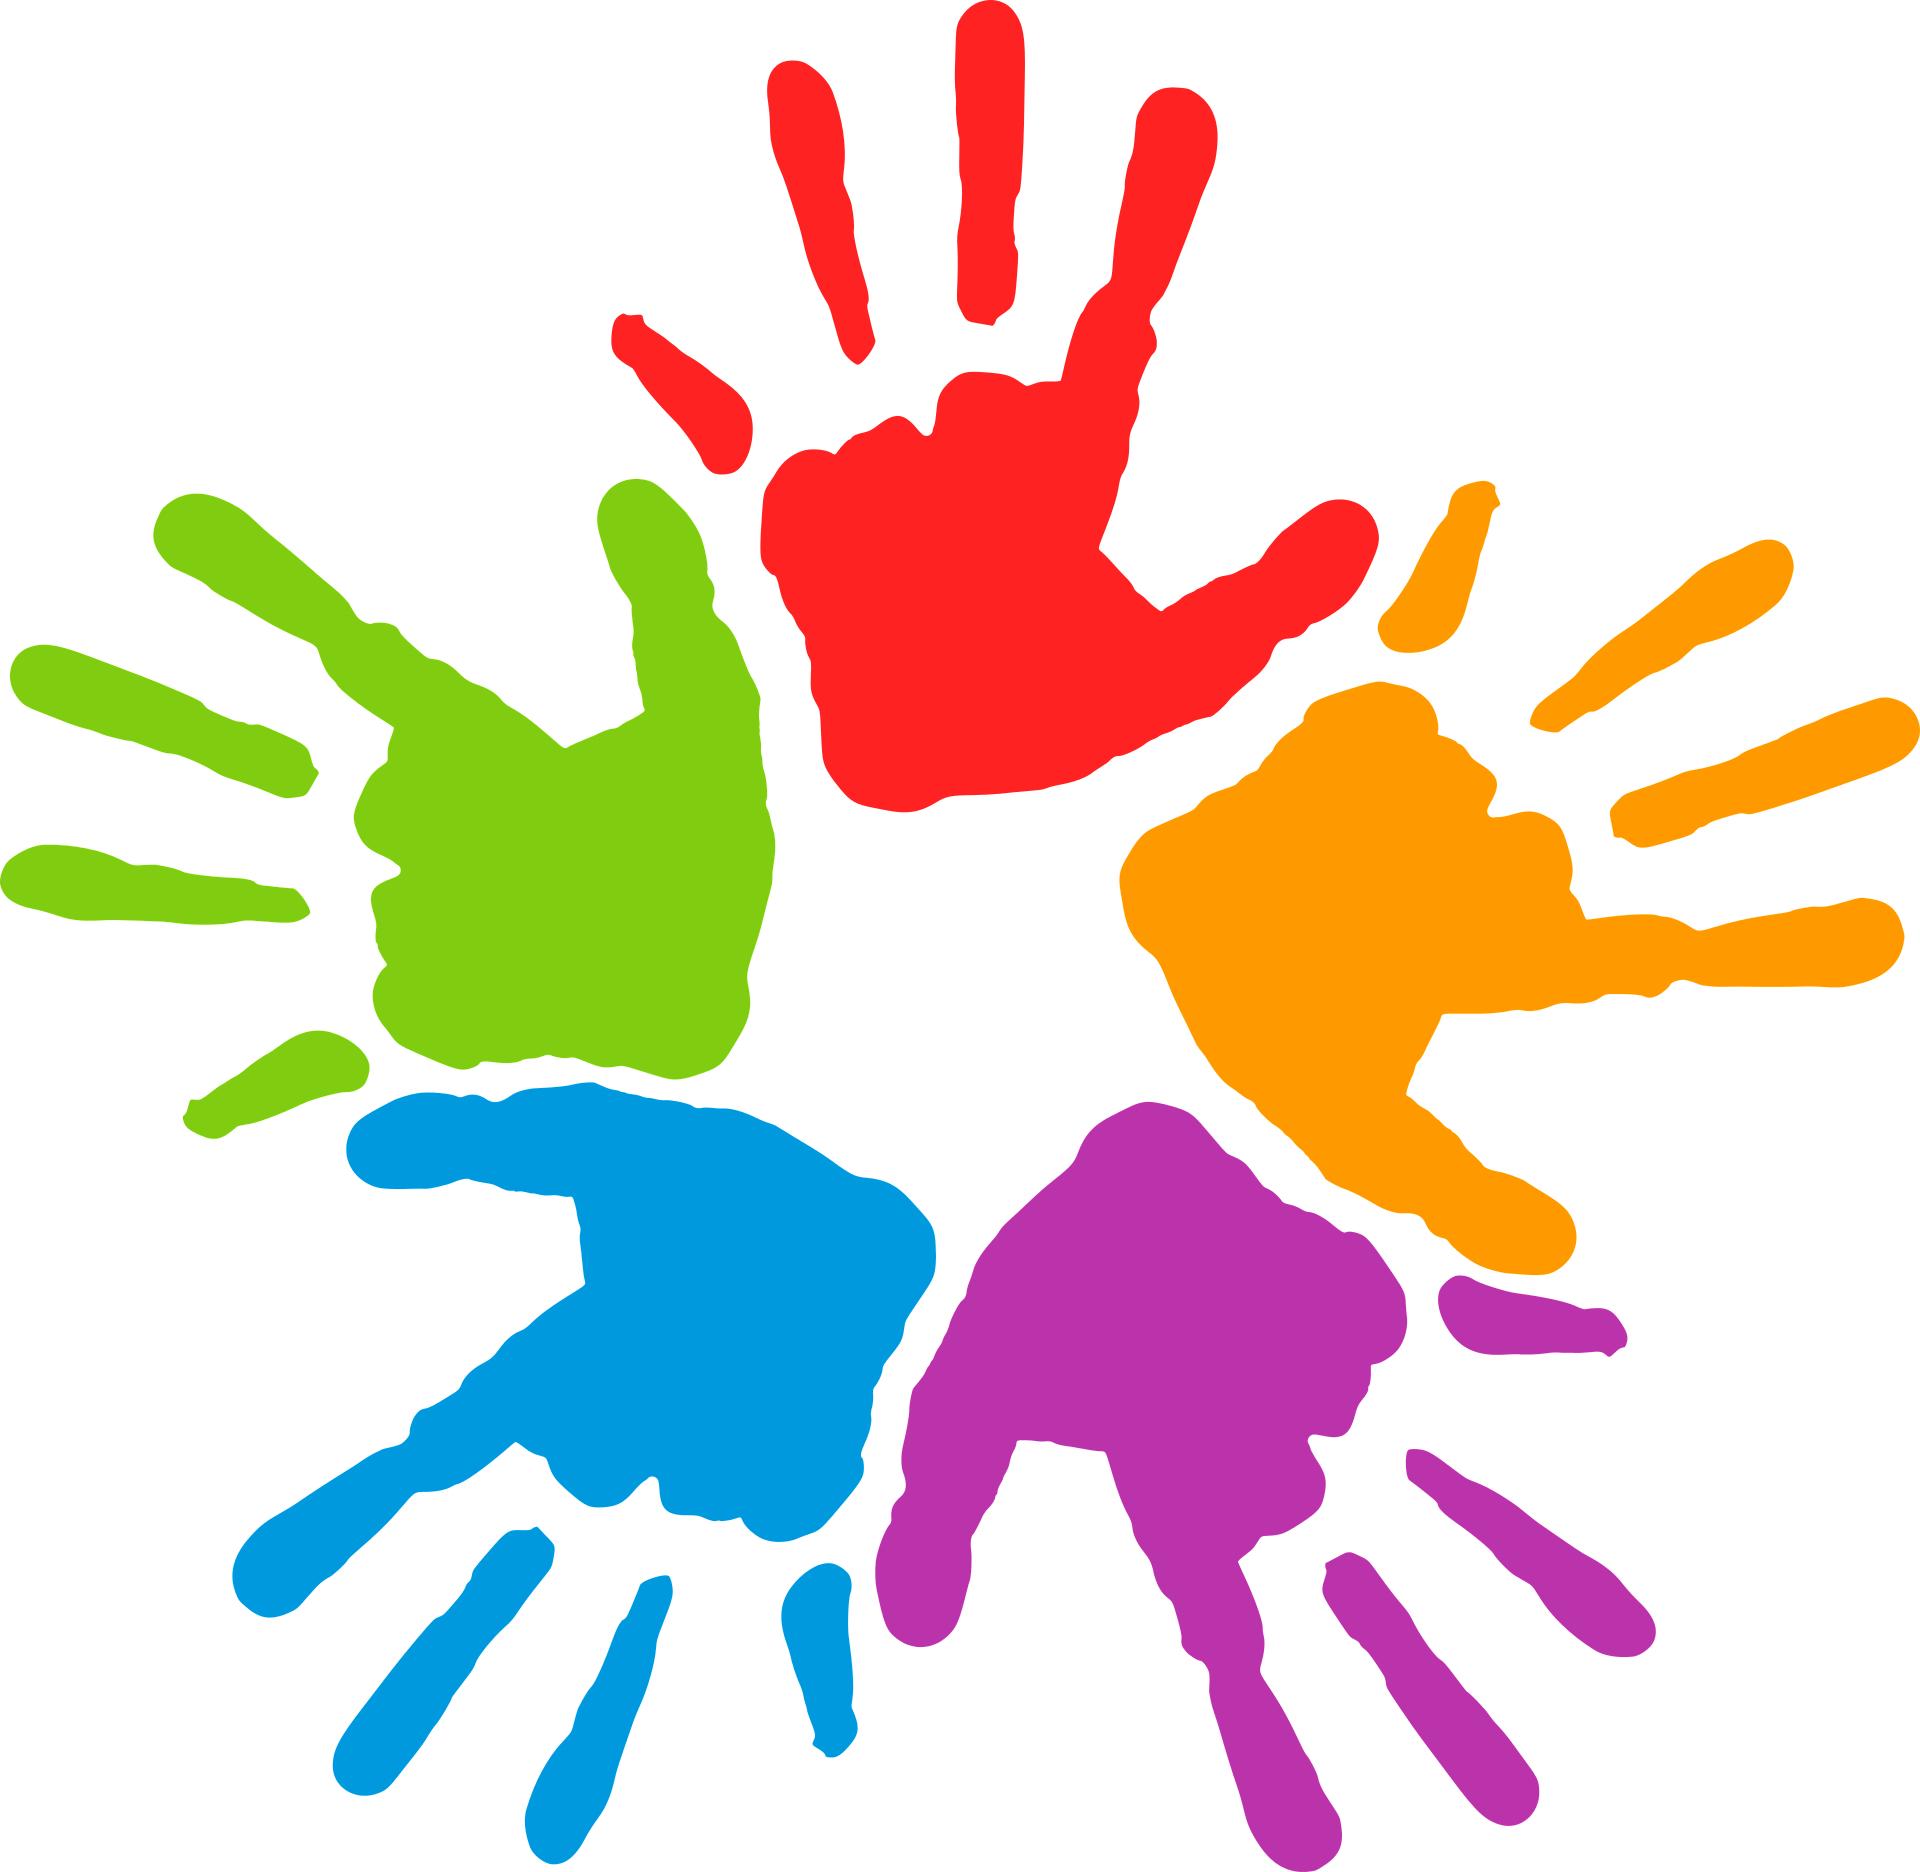 KiTa-Fortbildung online: Familie im (digitalen) Wandel